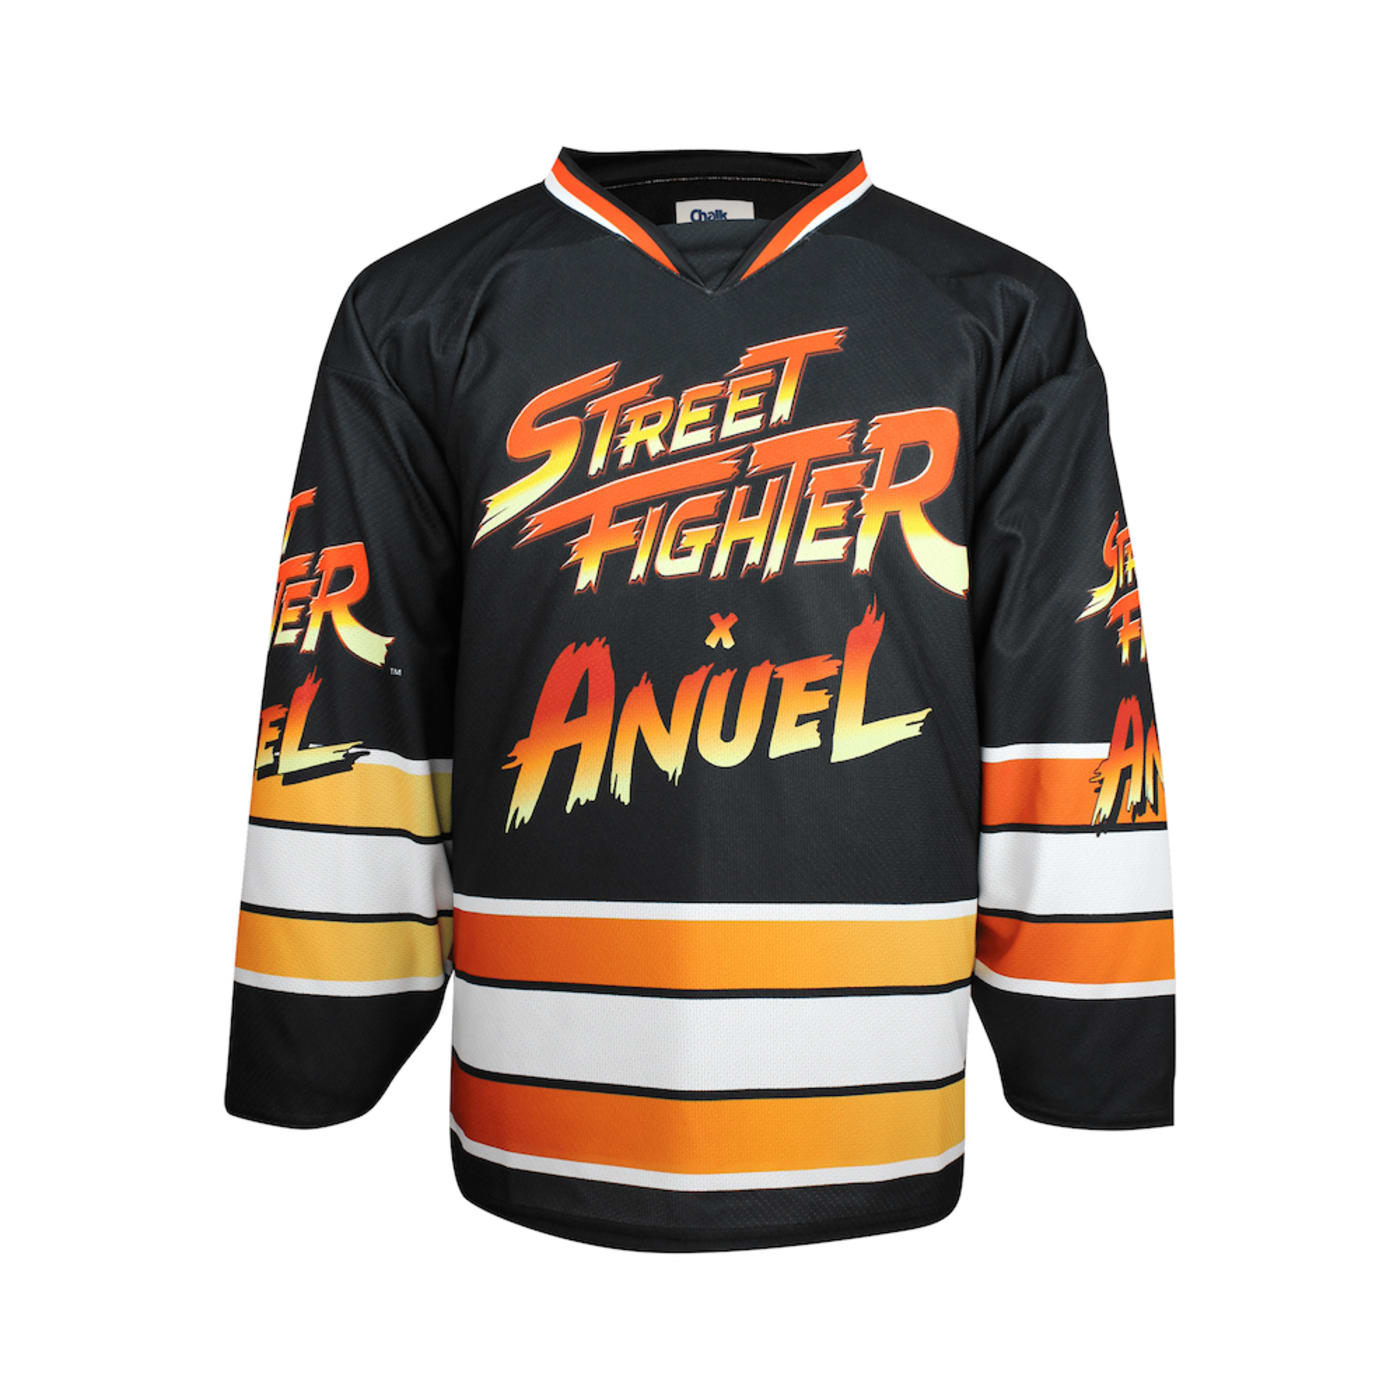 Anuel AA vs. Street Fighter